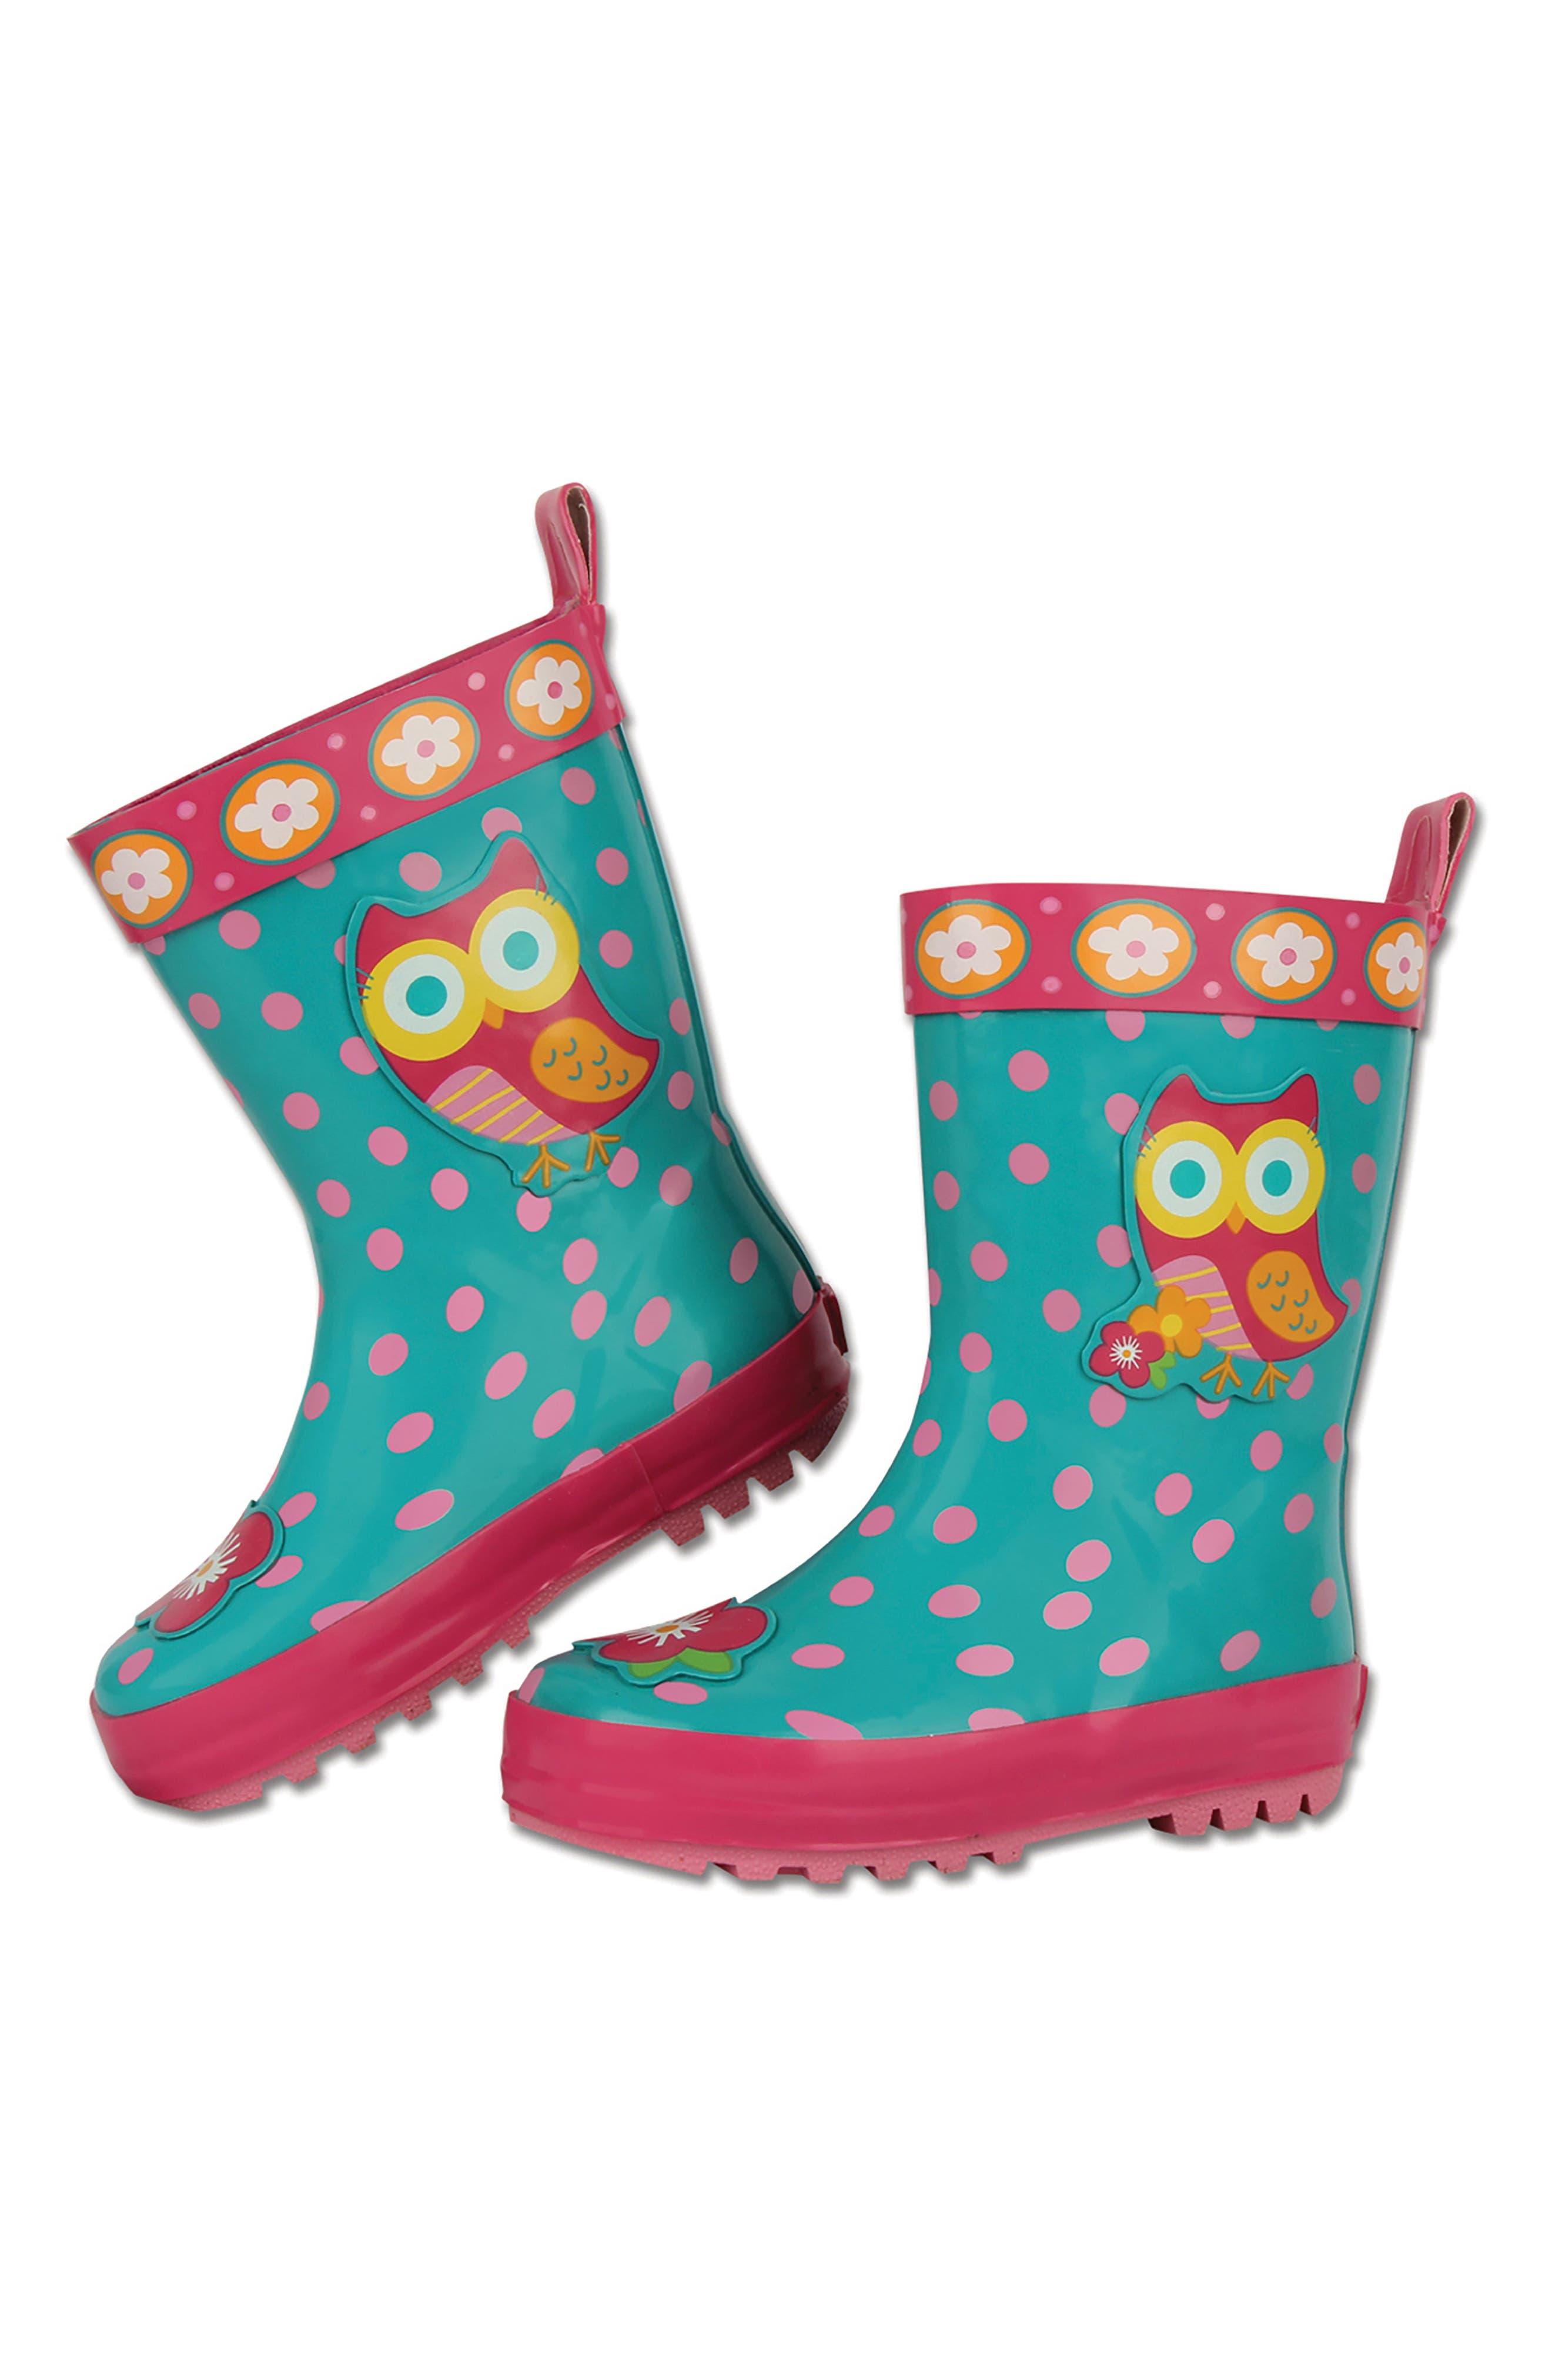 Owl Rain Boots & Umbrella Set,                             Alternate thumbnail 2, color,                             Owl